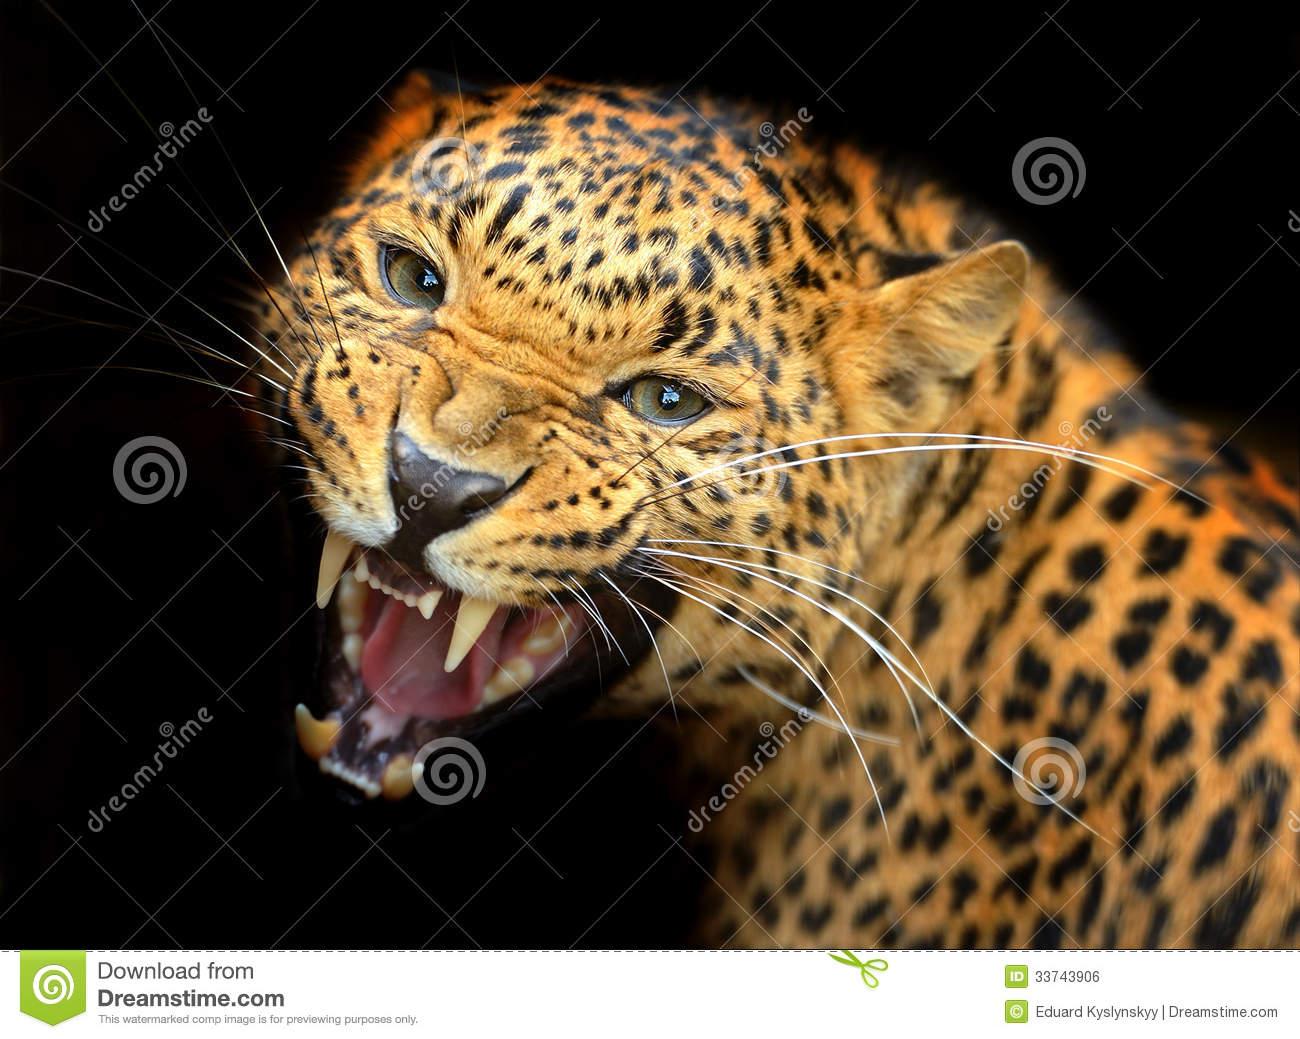 Amur Leopard clipart #14, Download drawings